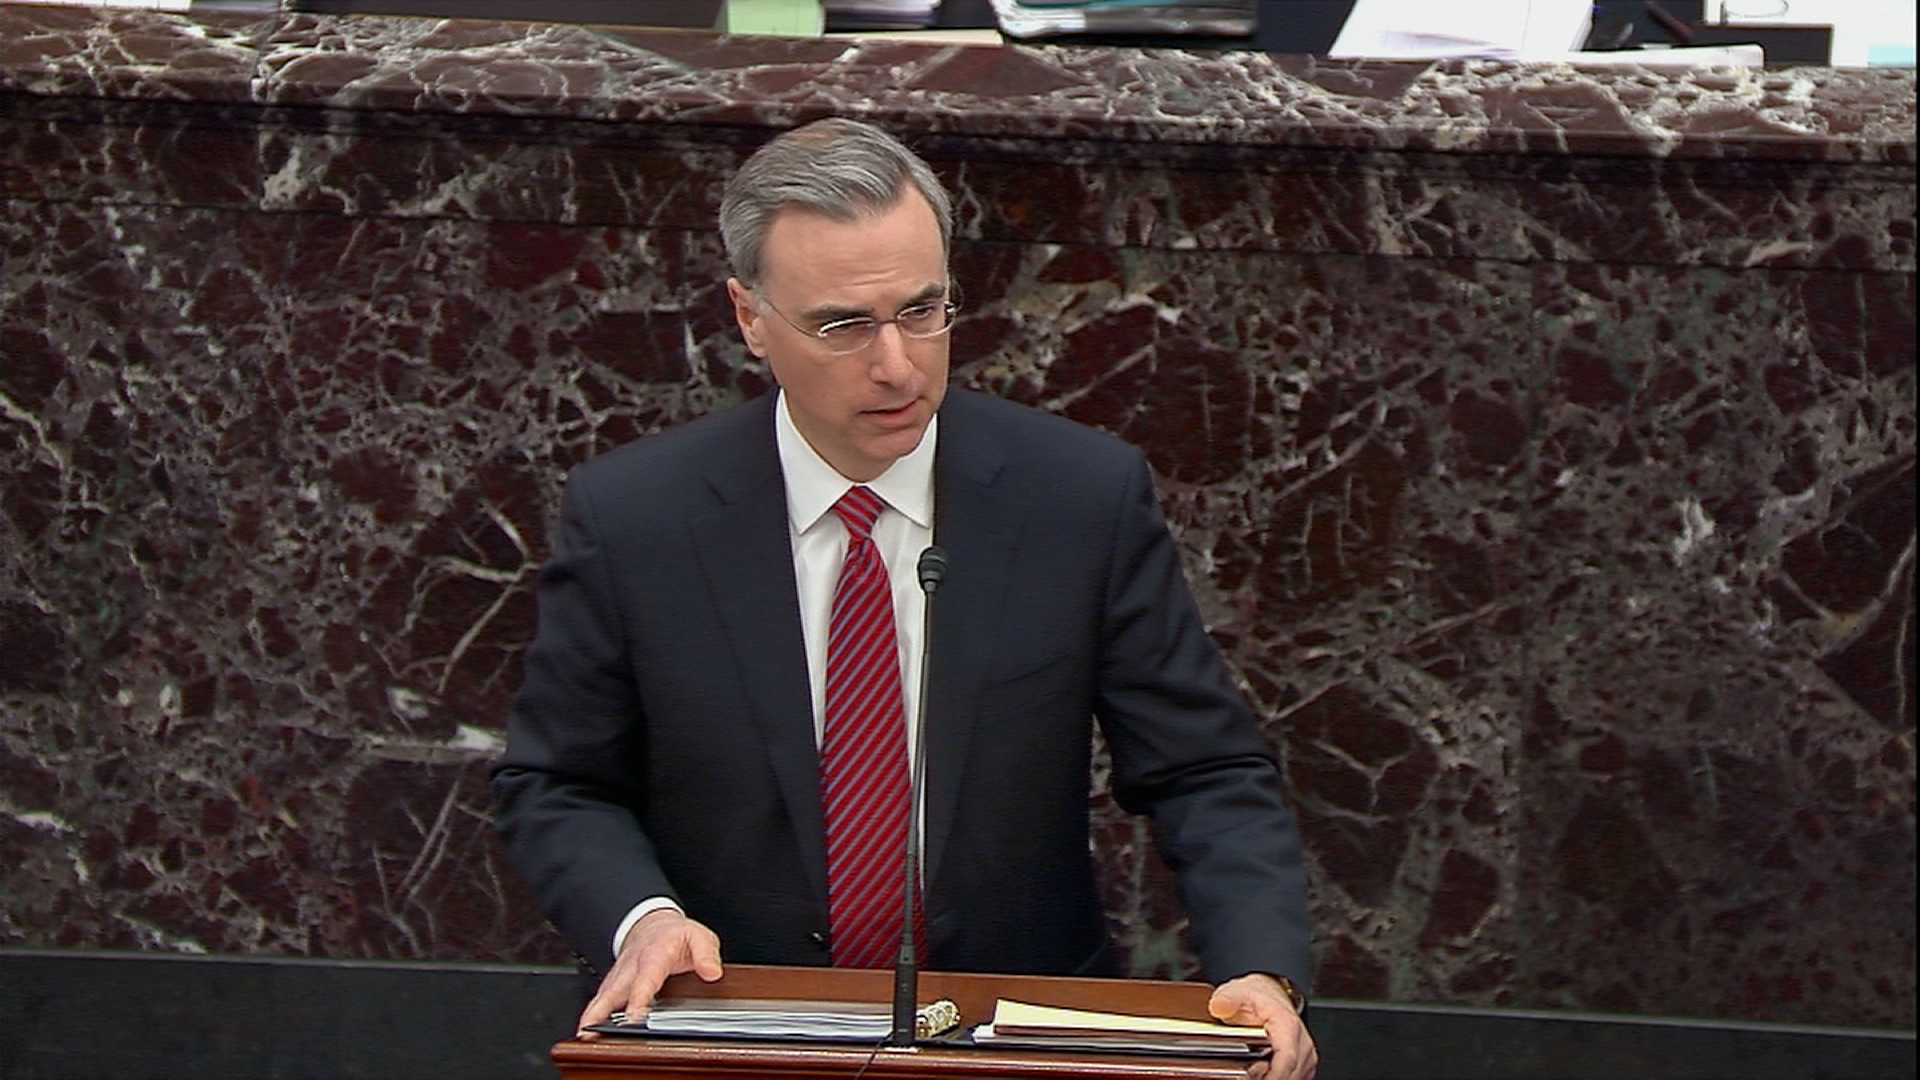 Pat Cipollone speaks on the Senate floor.